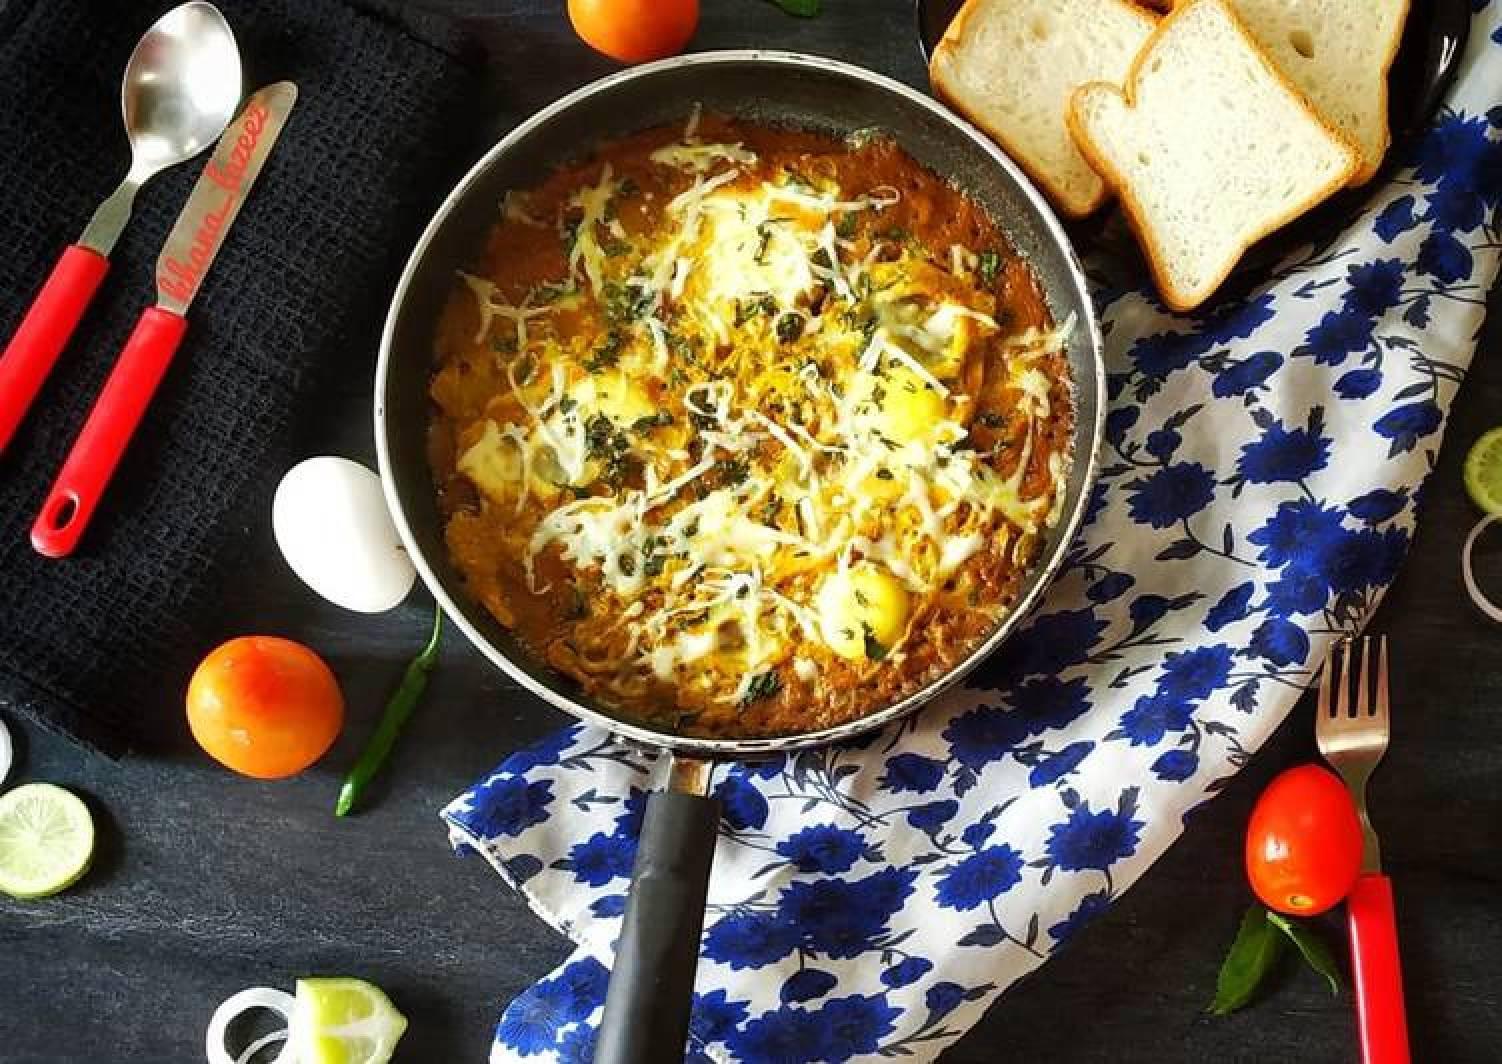 SHAKSHUKA - a Middle Eastern dish